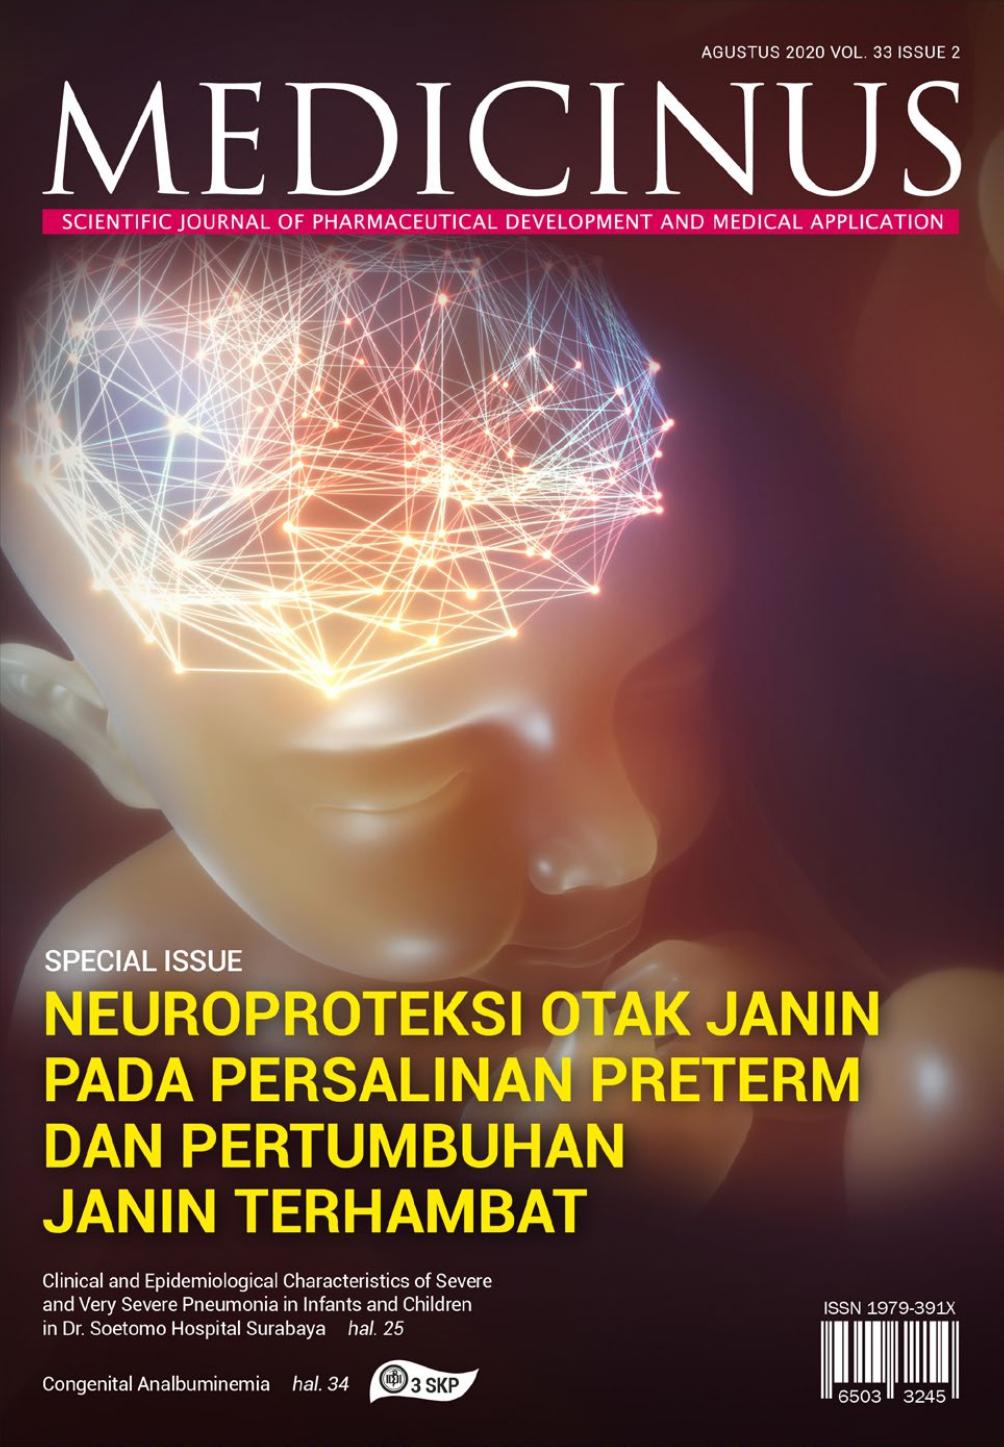 Medicinus Vol. 33 No. 2 - Agustus 2020